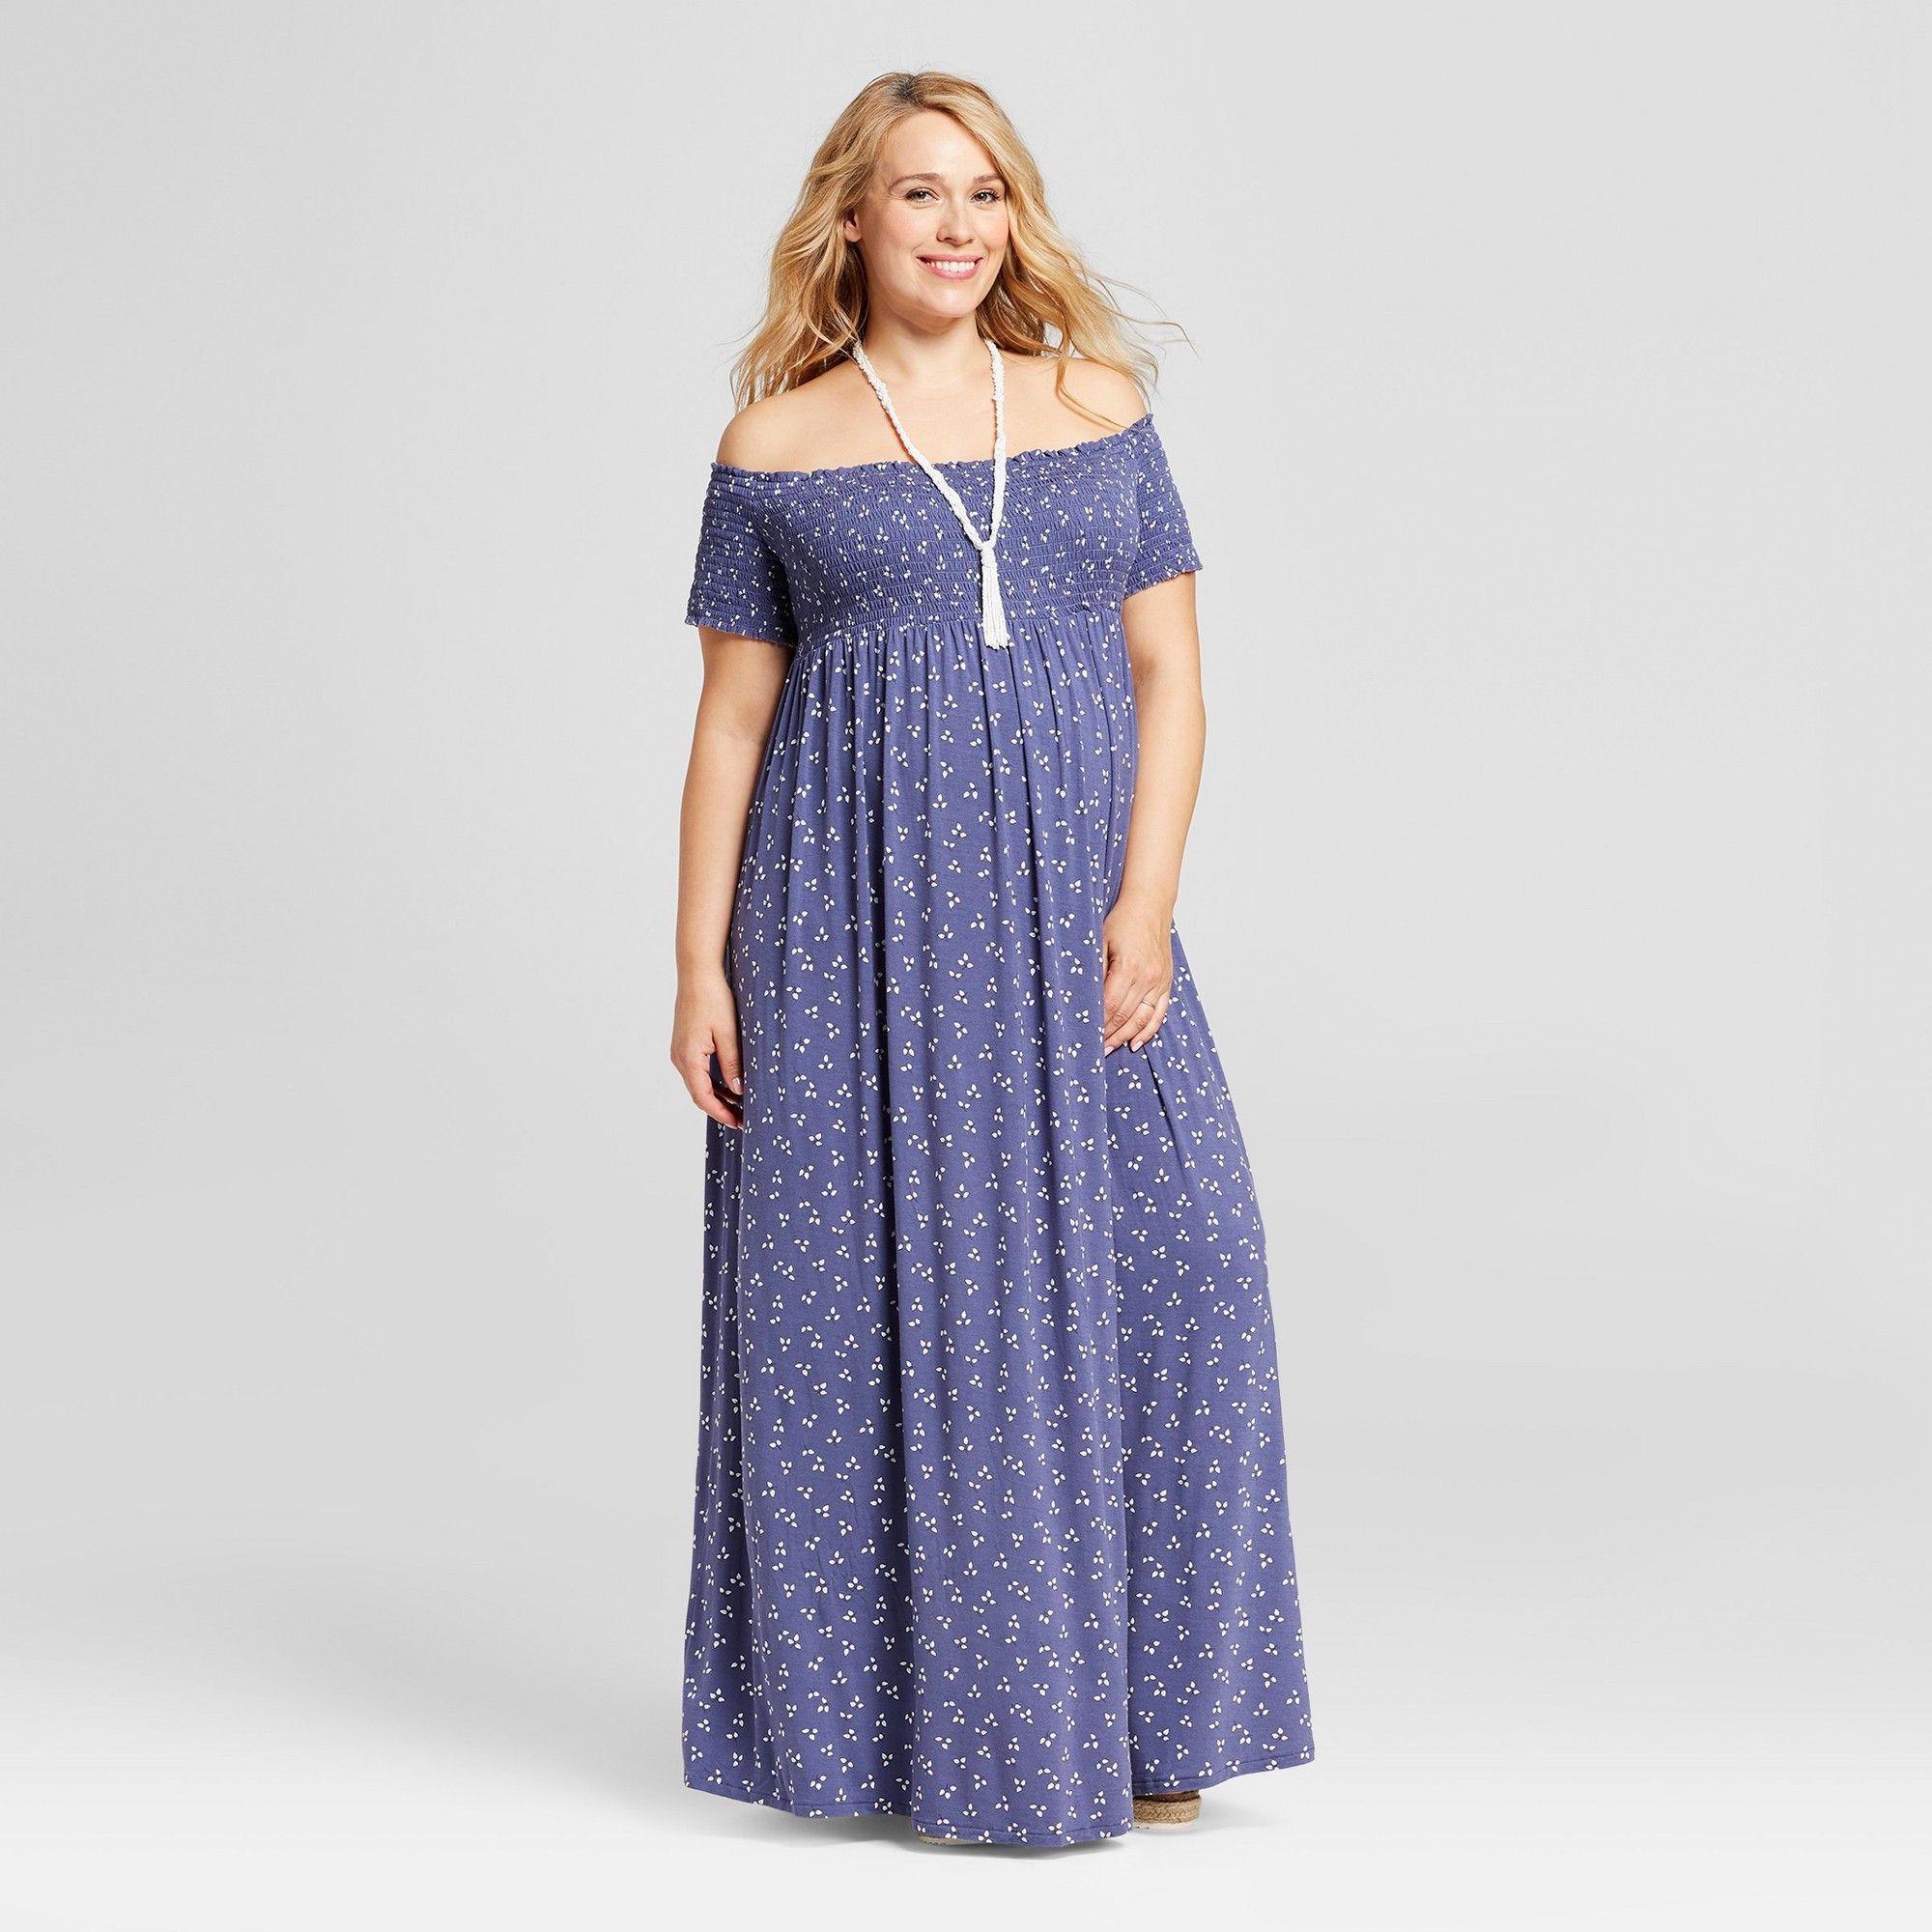 2fd4987e8f53 Maternity Plus Size Smocked Maxi Dress - Isabel Maternity by Ingrid & Isabel  Midnight Sky Print 2X, Women's, Blue